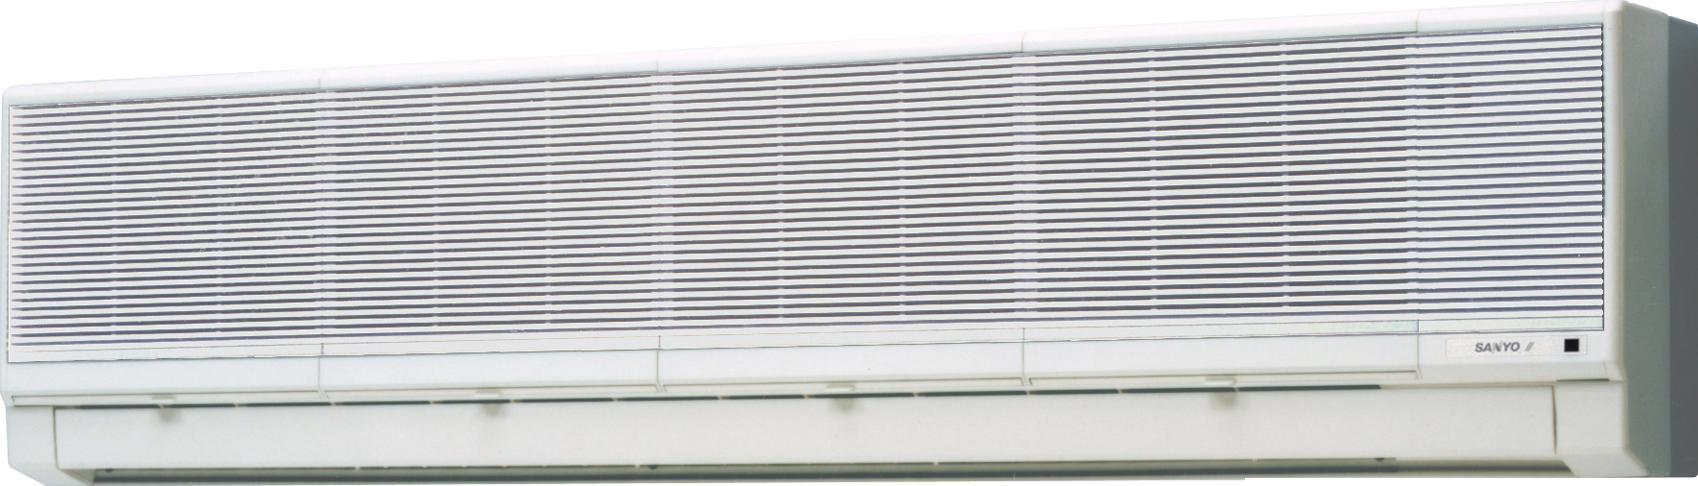 Sanyo Wall Mounted Heat Pump - 26KHHS72R KH2672R